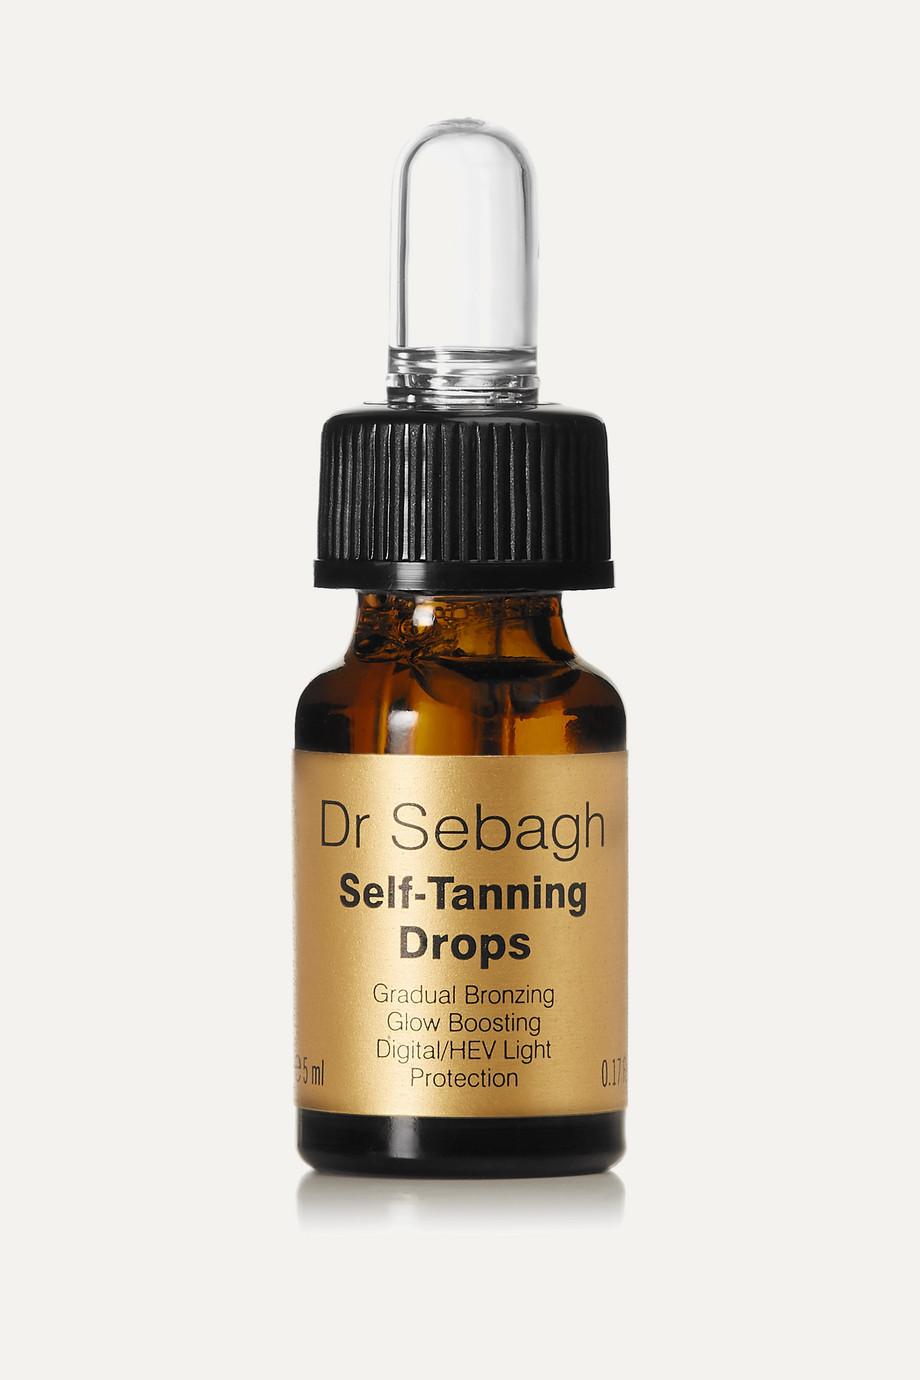 Dr Sebagh Self-Tanning Drops, 5 ml – Selbstbräunungstropfen